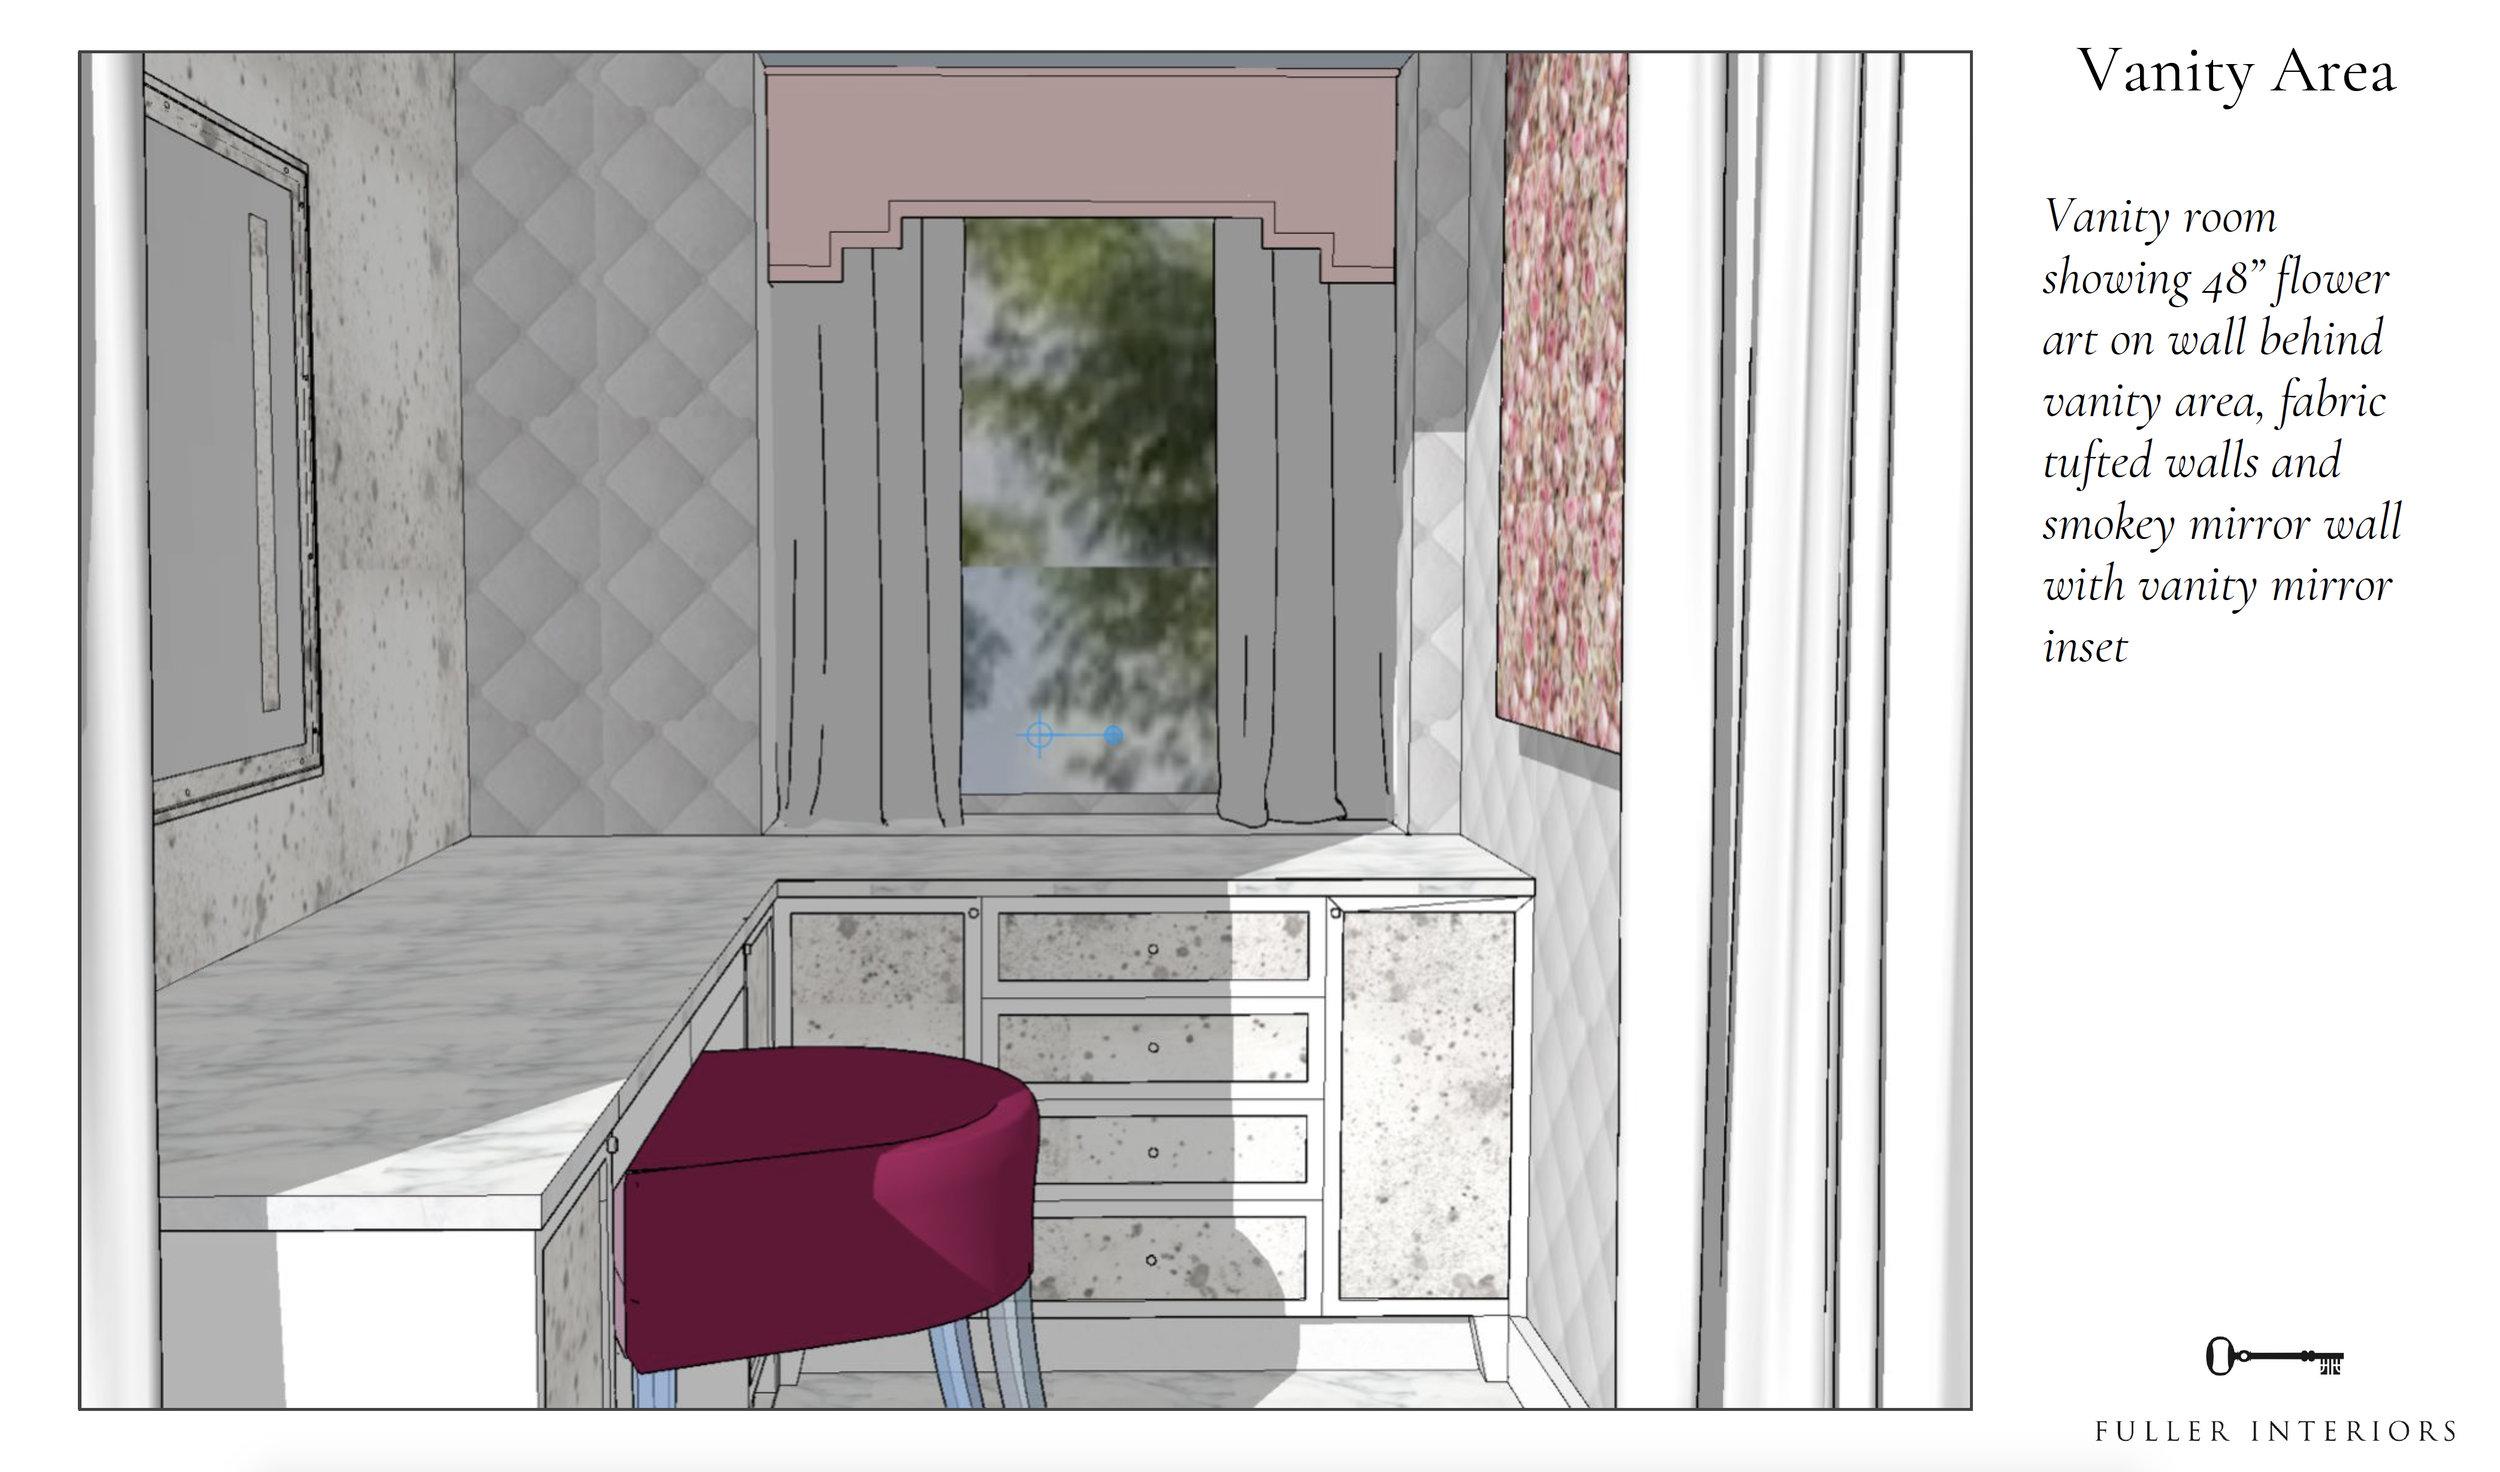 Fuller_Interiors_1.jpg